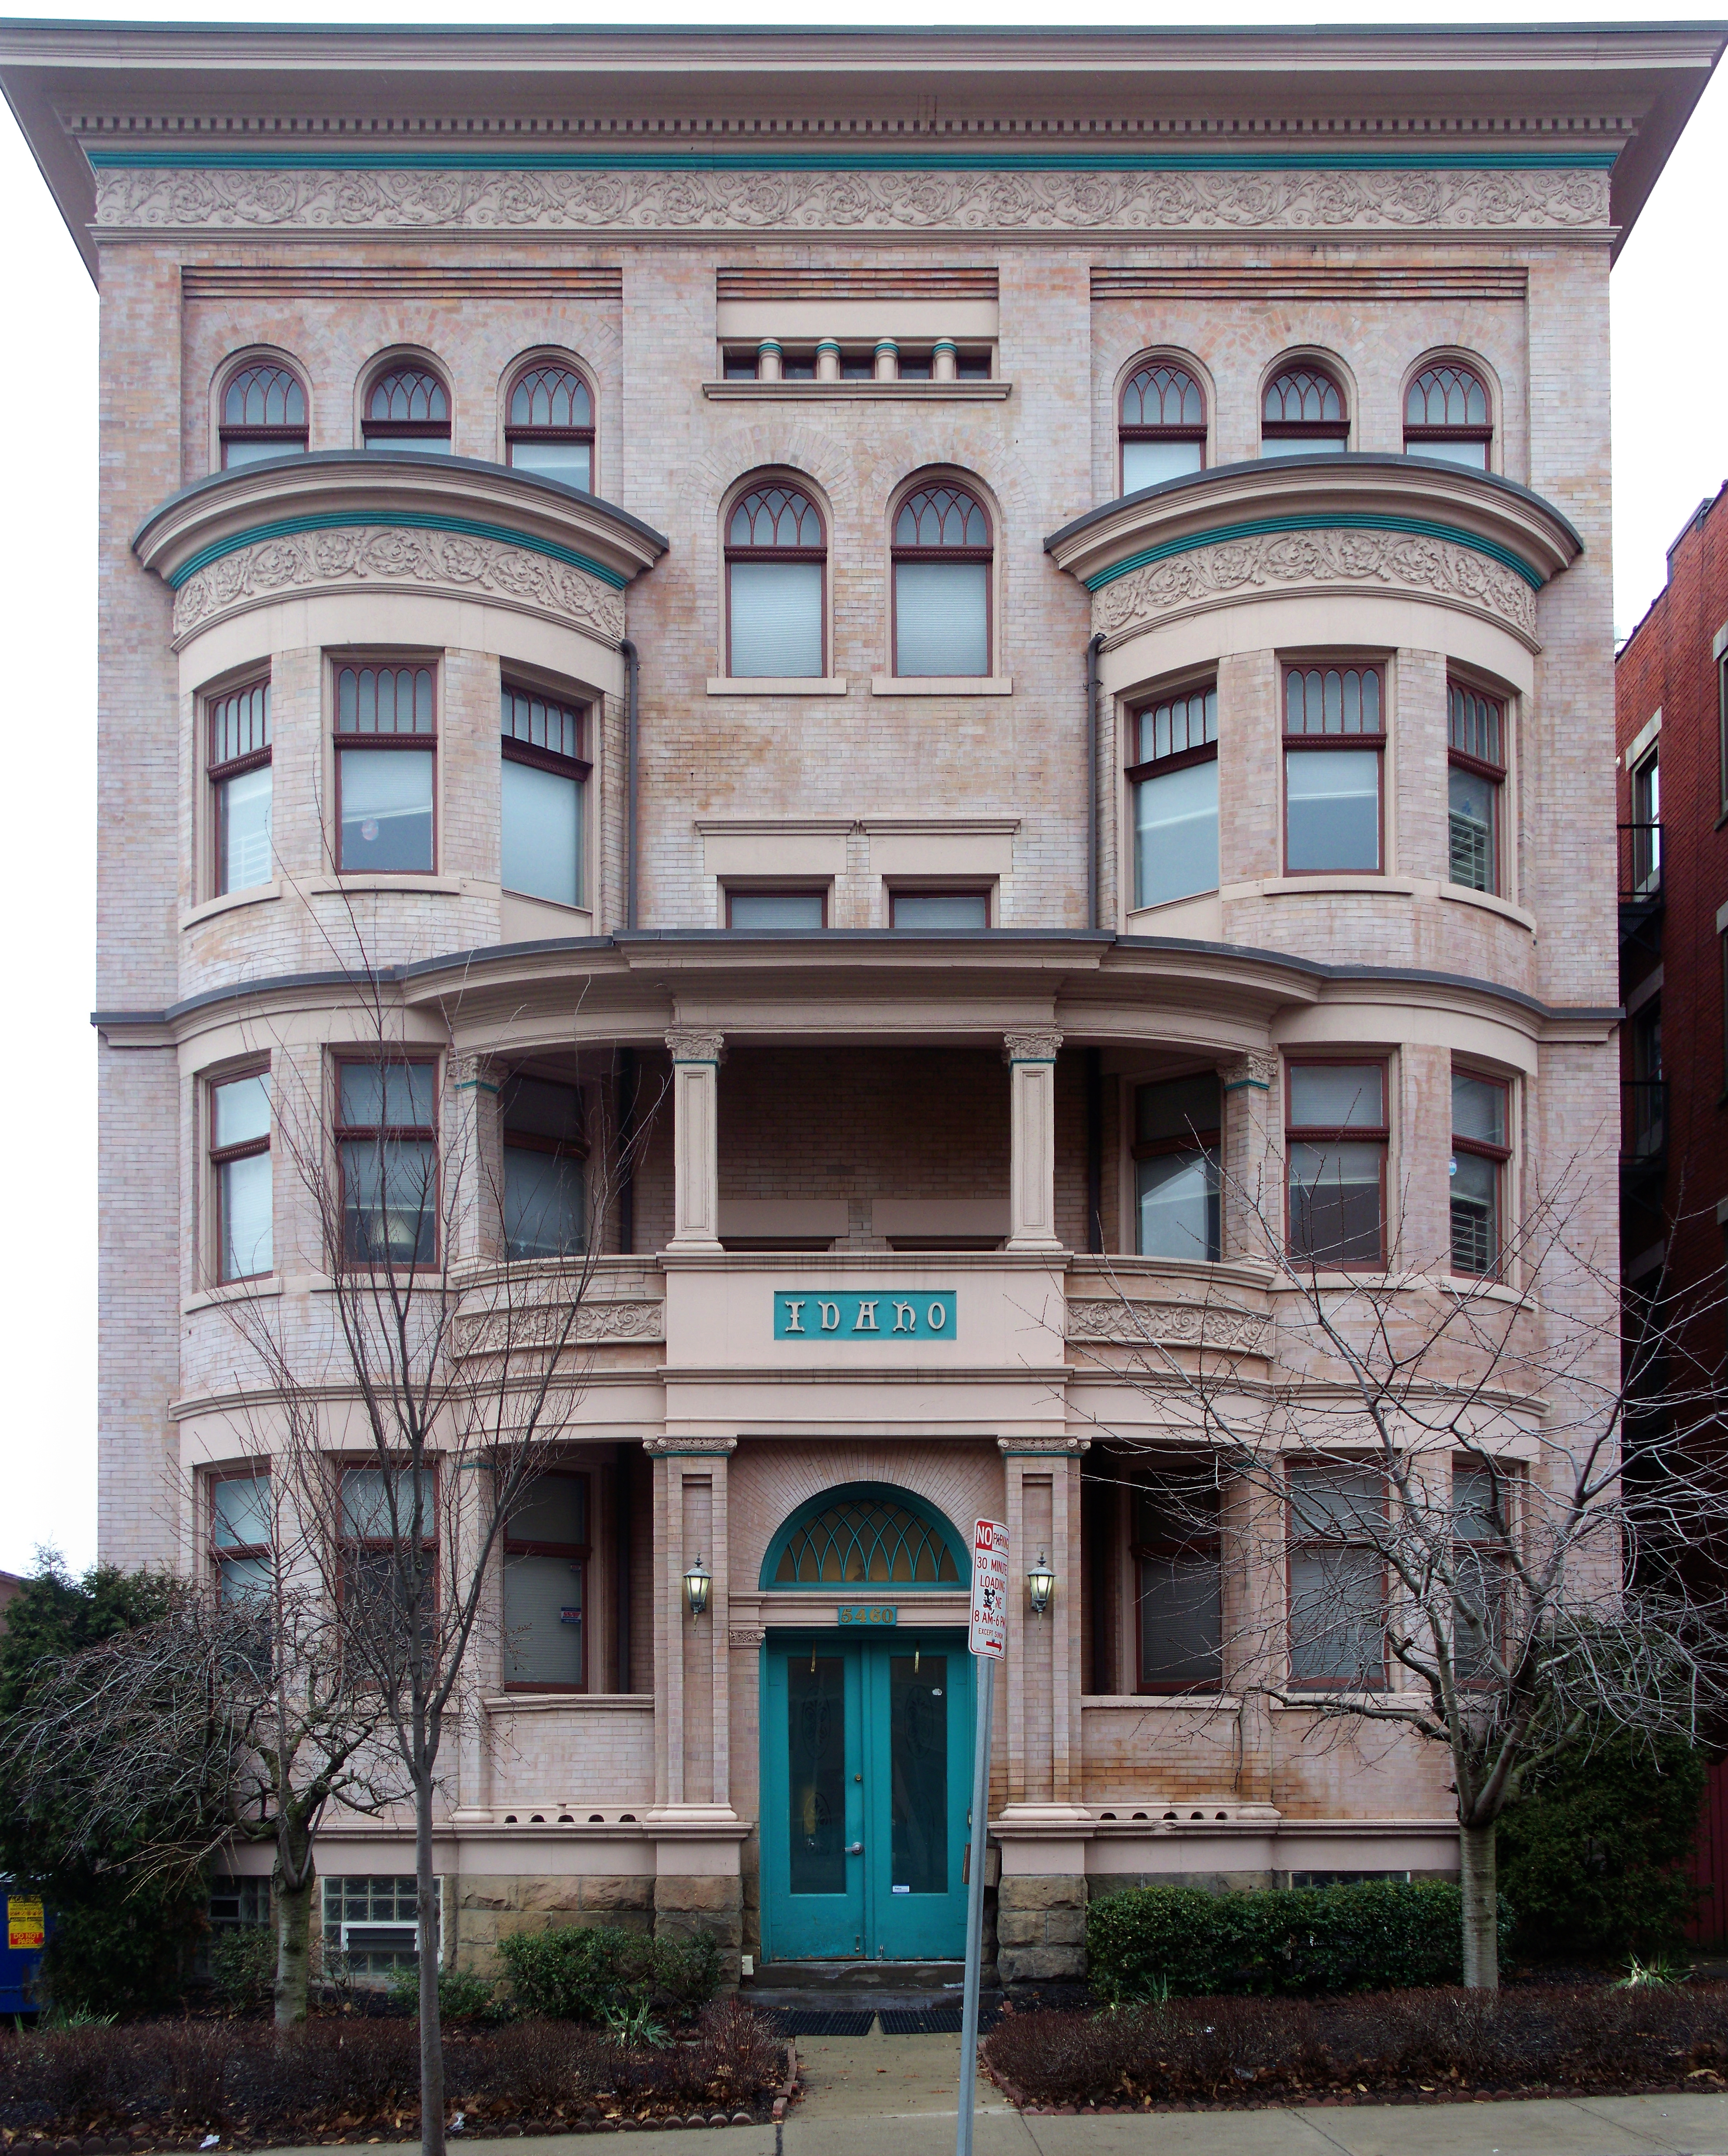 Garfield Park Apartments: File:Idaho Apartments, Garfield, Pittsburgh, 2015-04-02